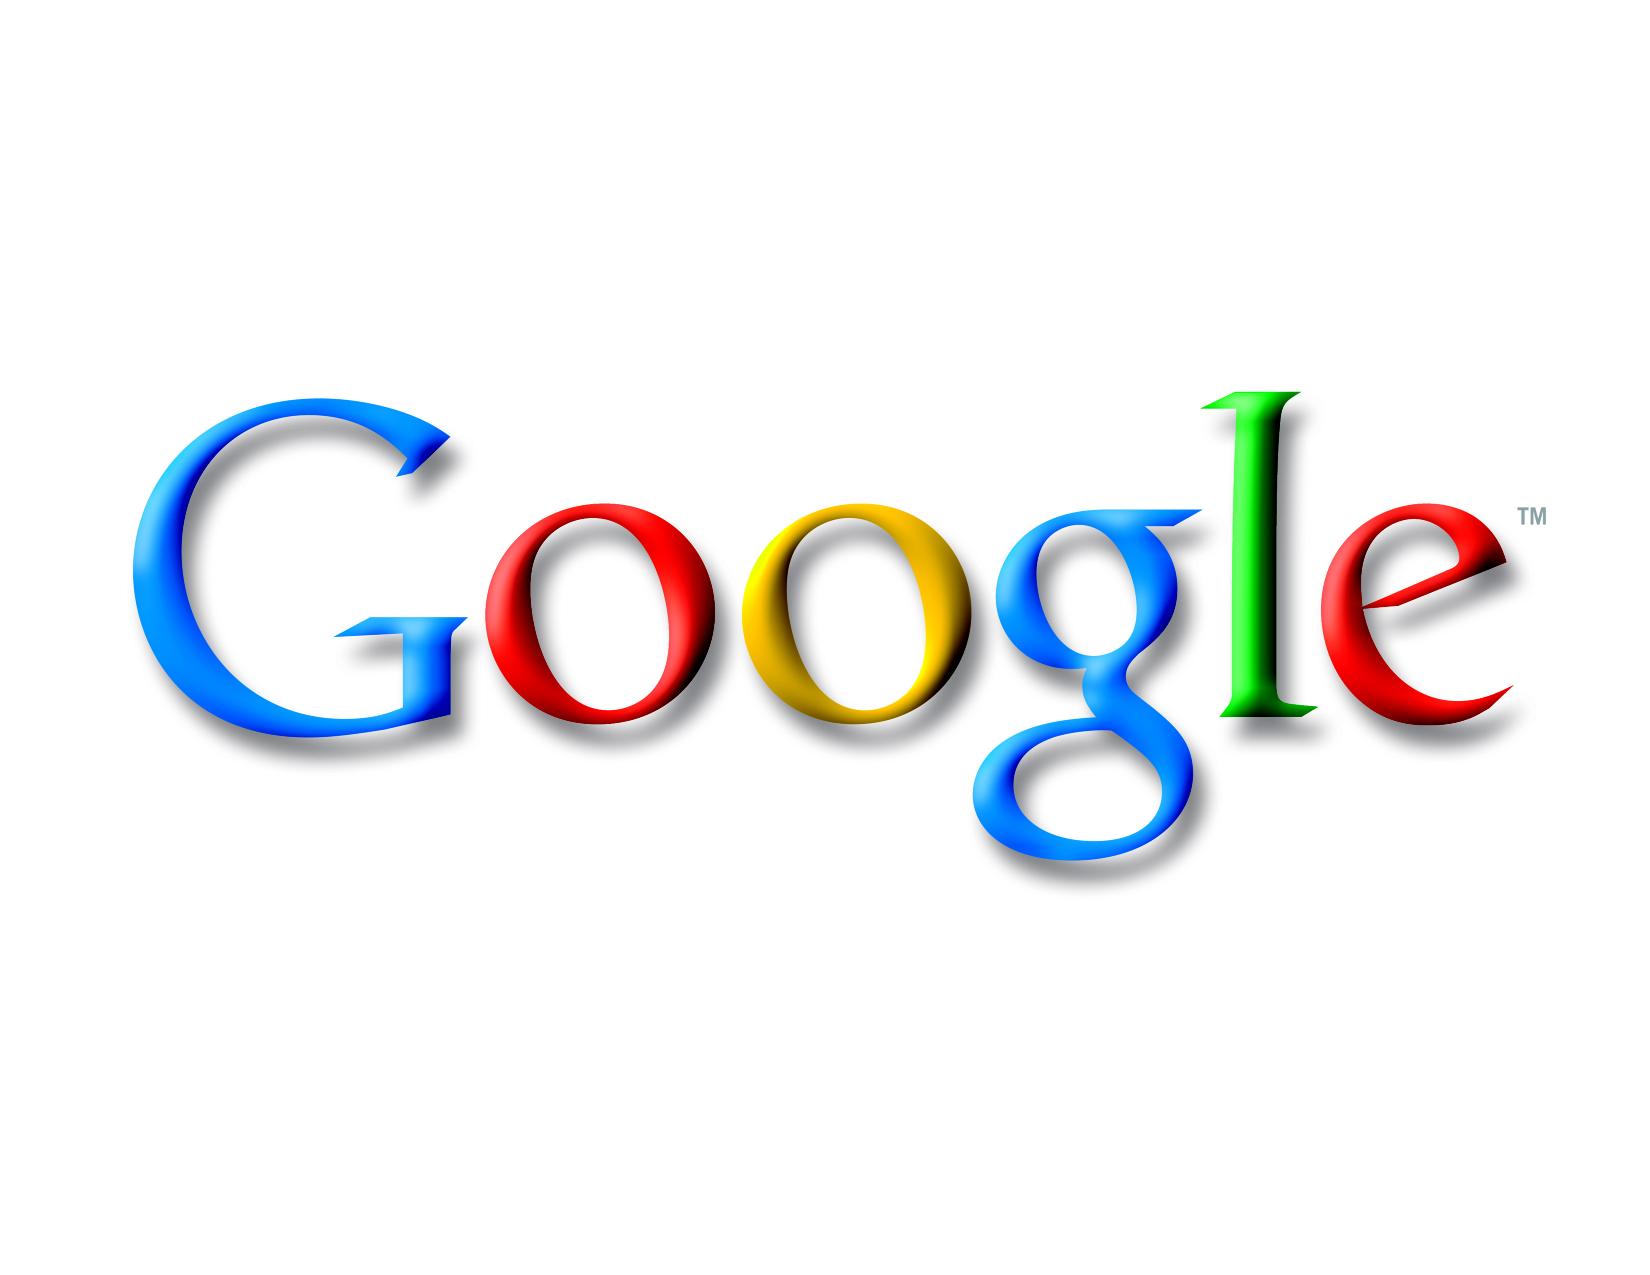 The Googled Graduate Student